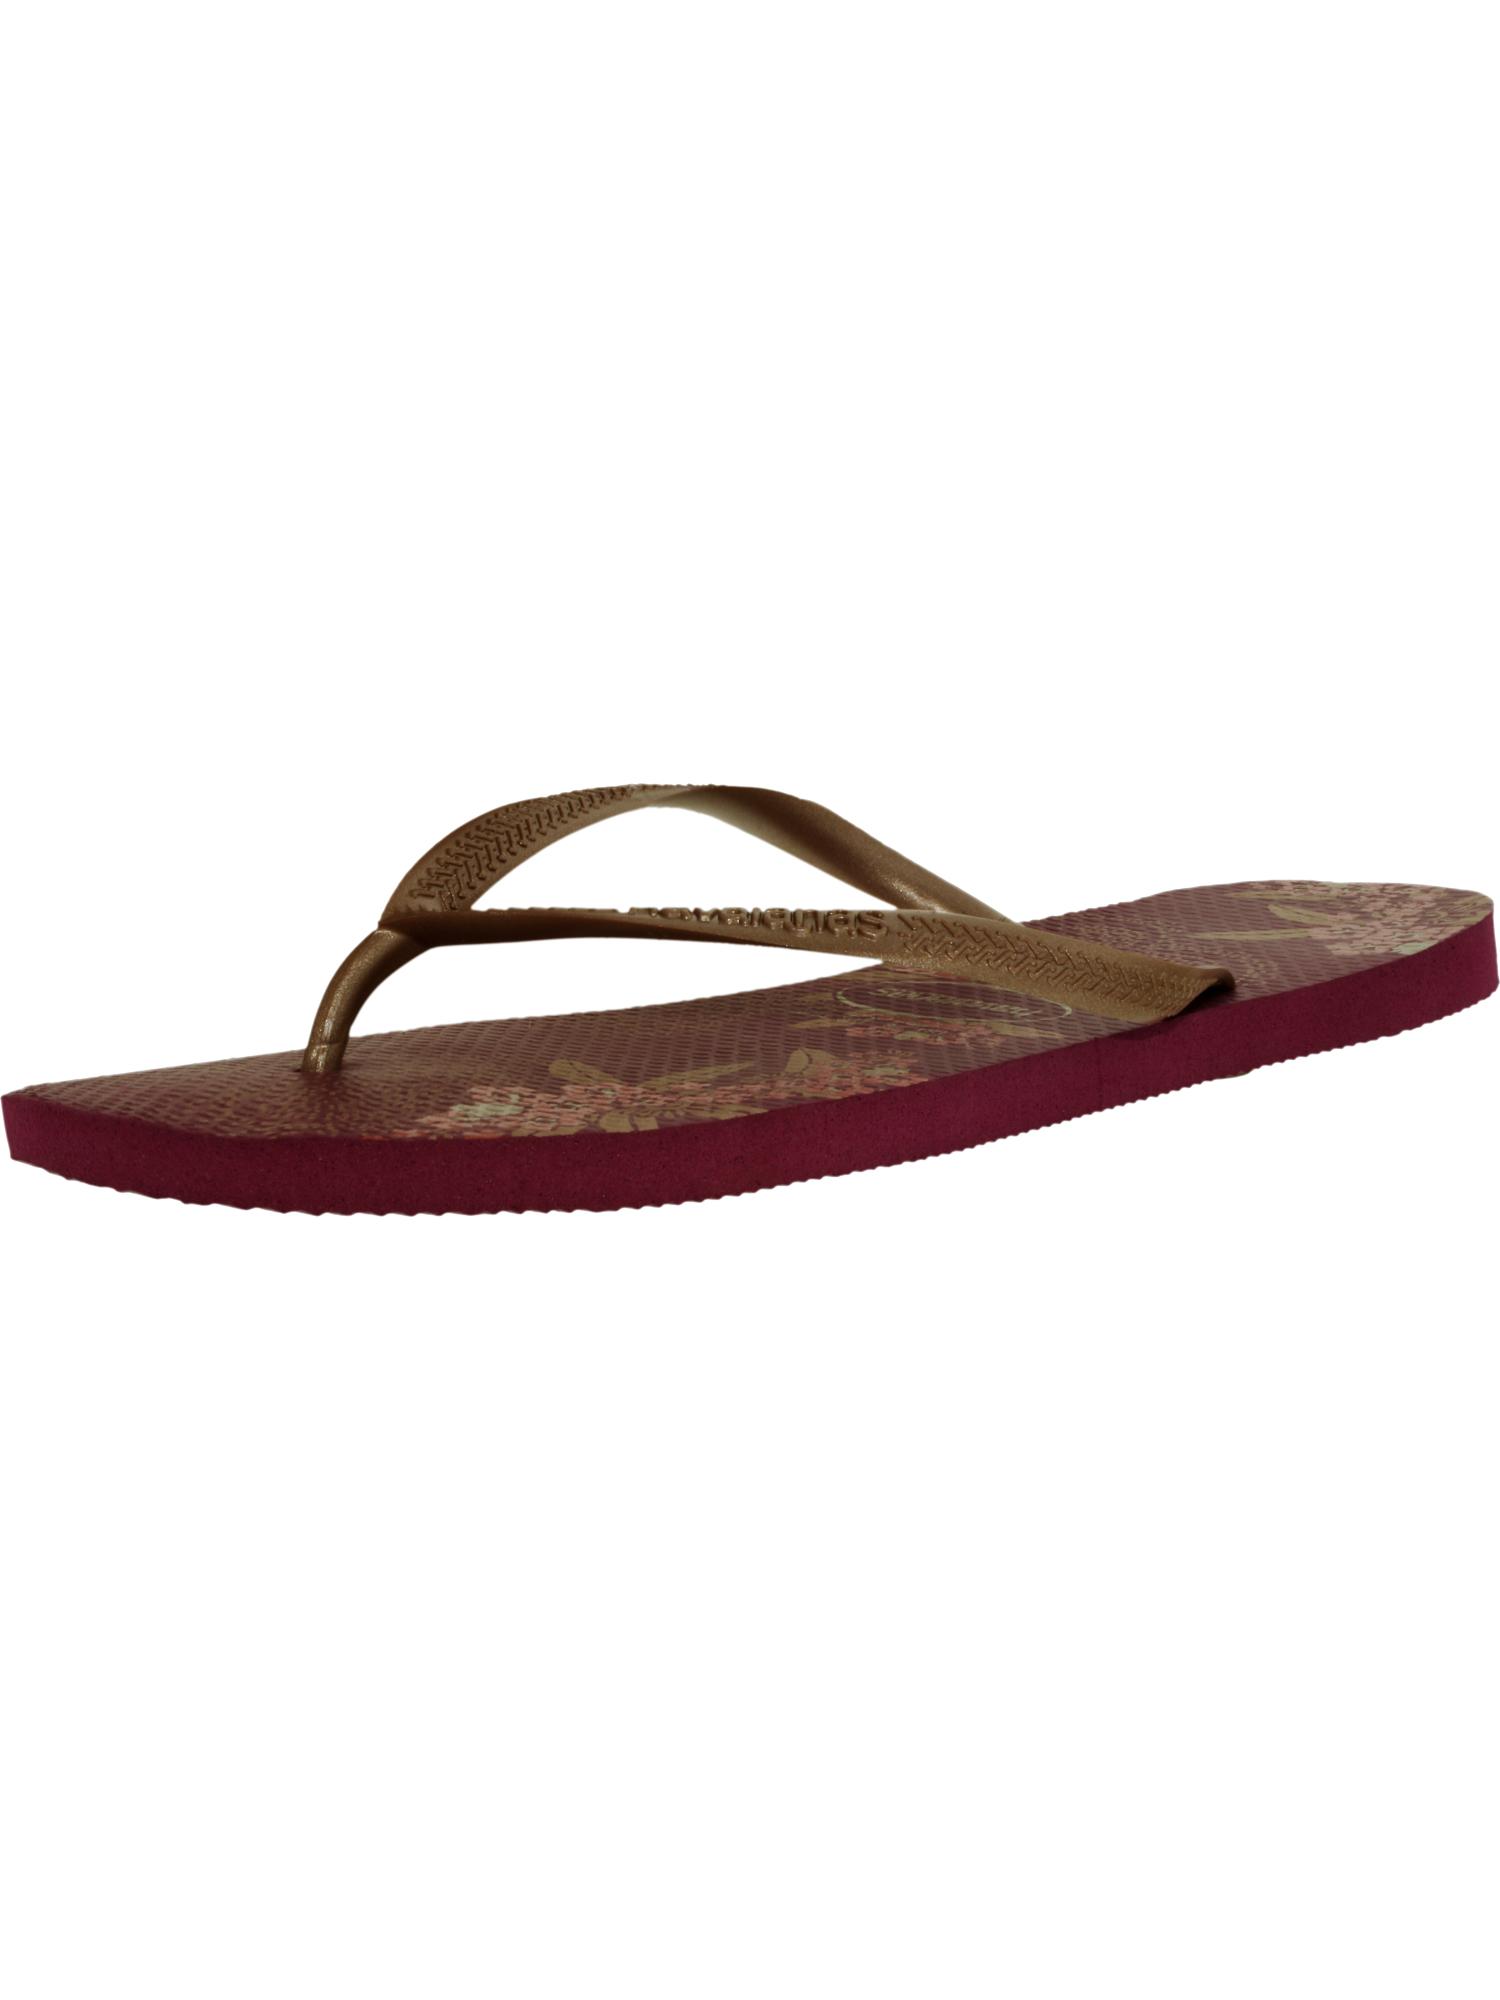 Havaianas Women's H. Slim Organic CF Acai Rubber Sandal - 12M HxnISl